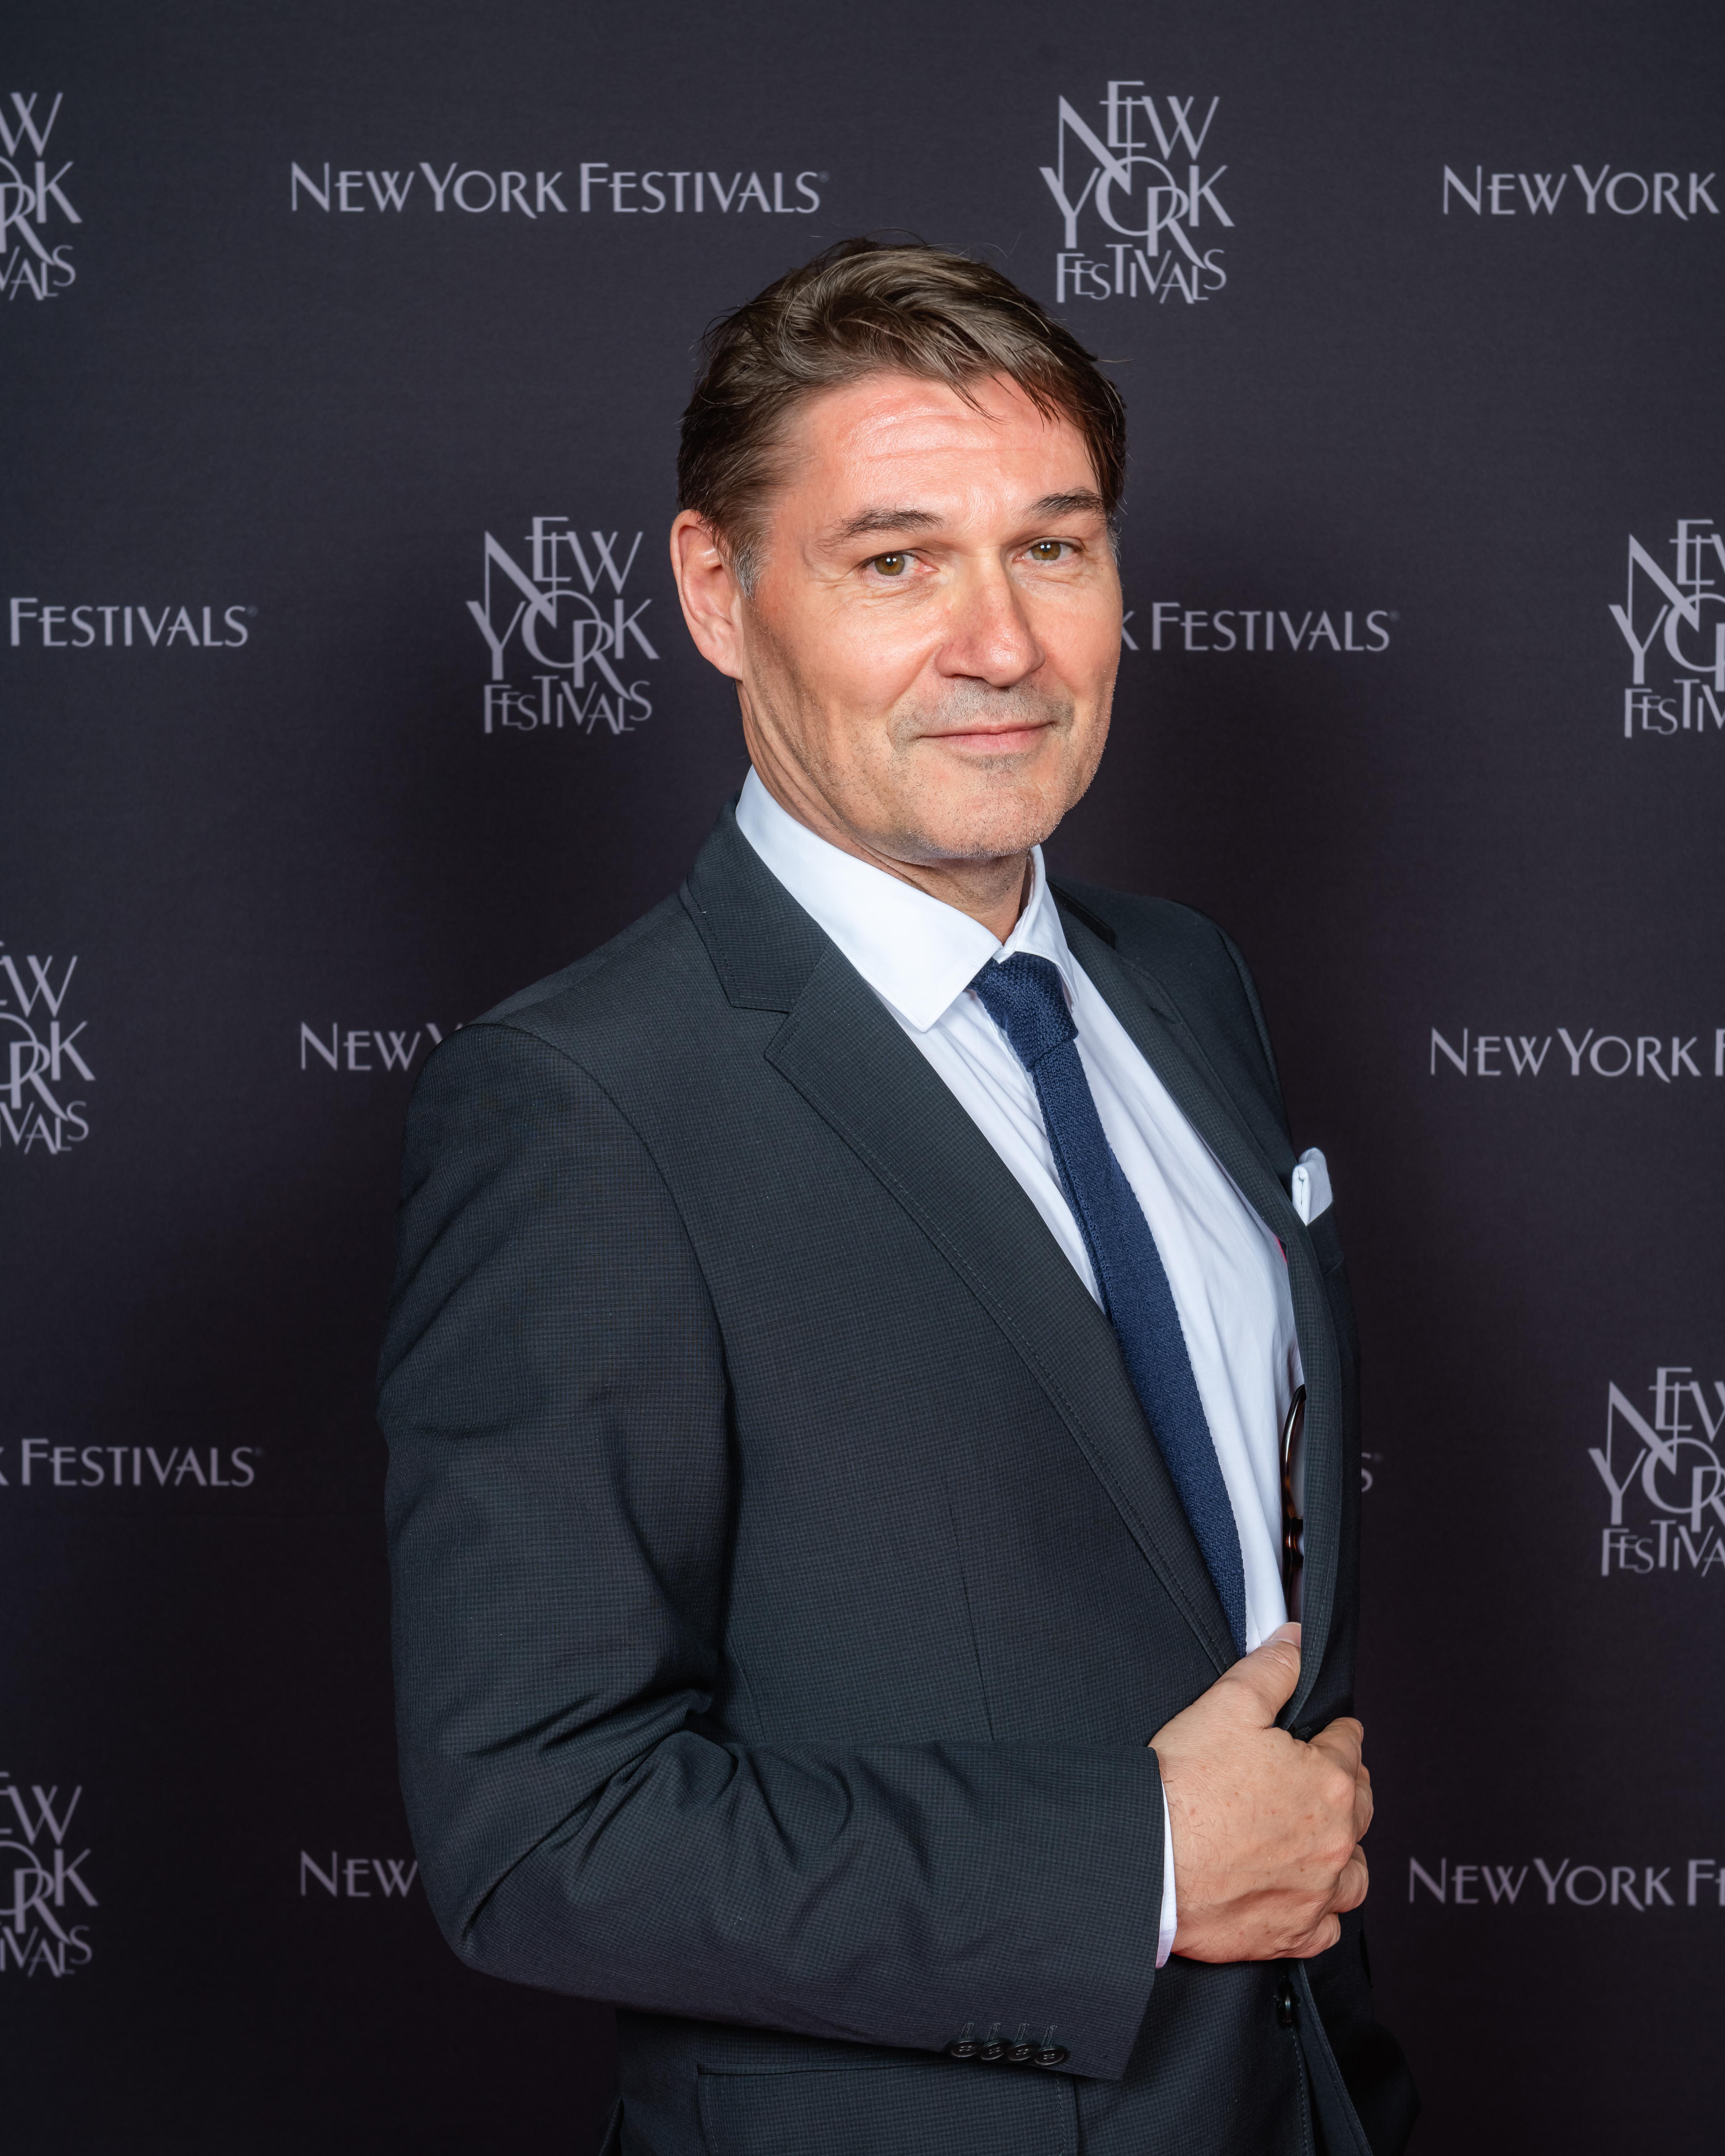 Jeremy JP Fekete NewYork Festivals 2019